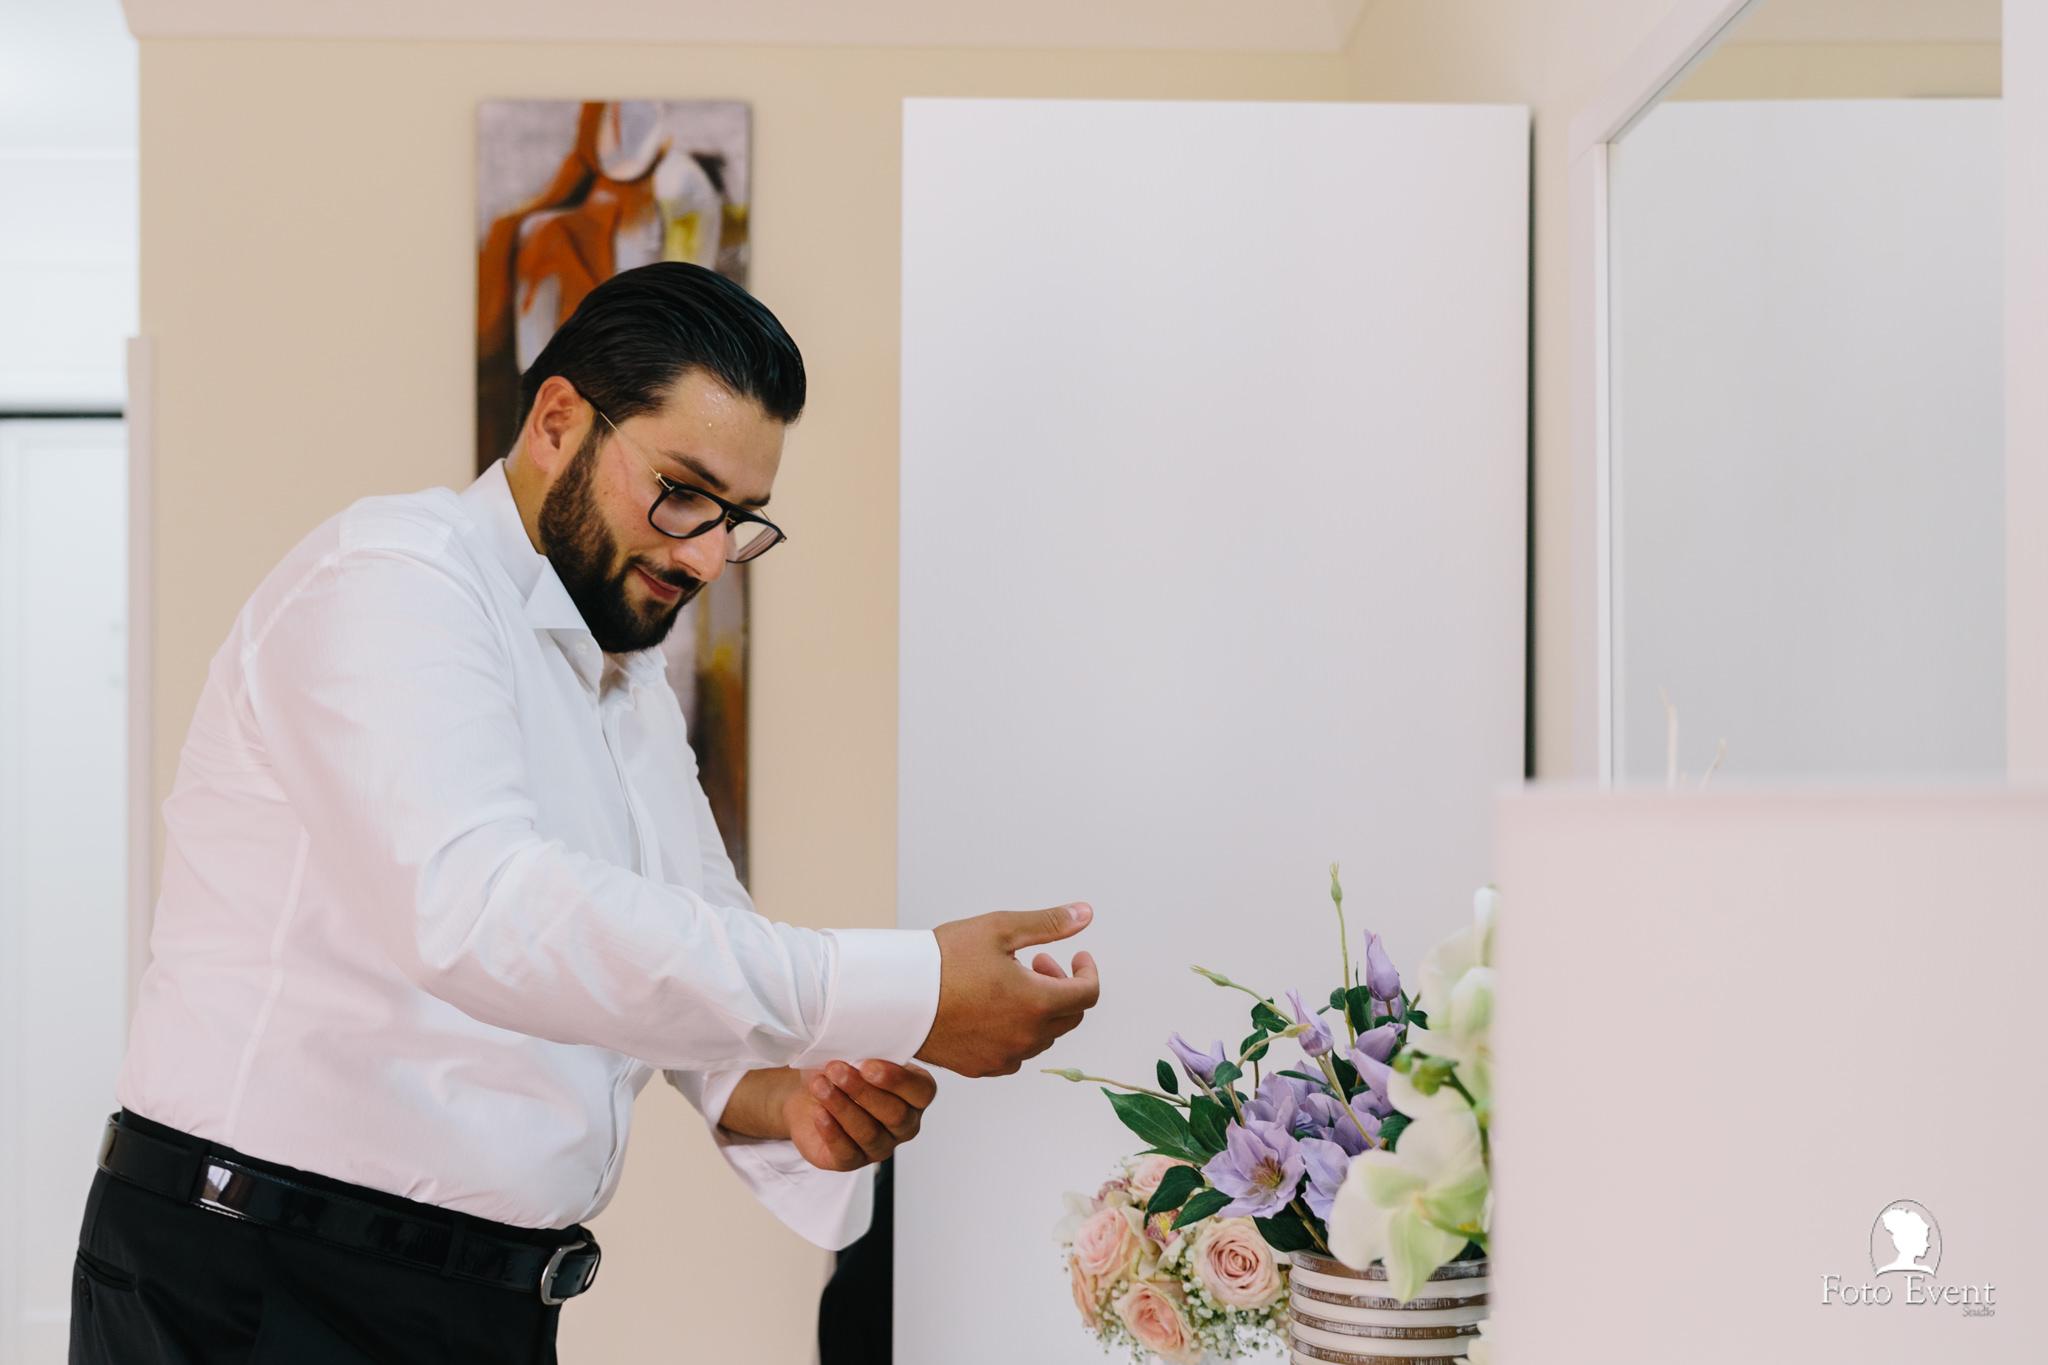 001-2019-09-09-Matrimonio-Dorotea-e-Alberto-Iemmolo-5DN-009